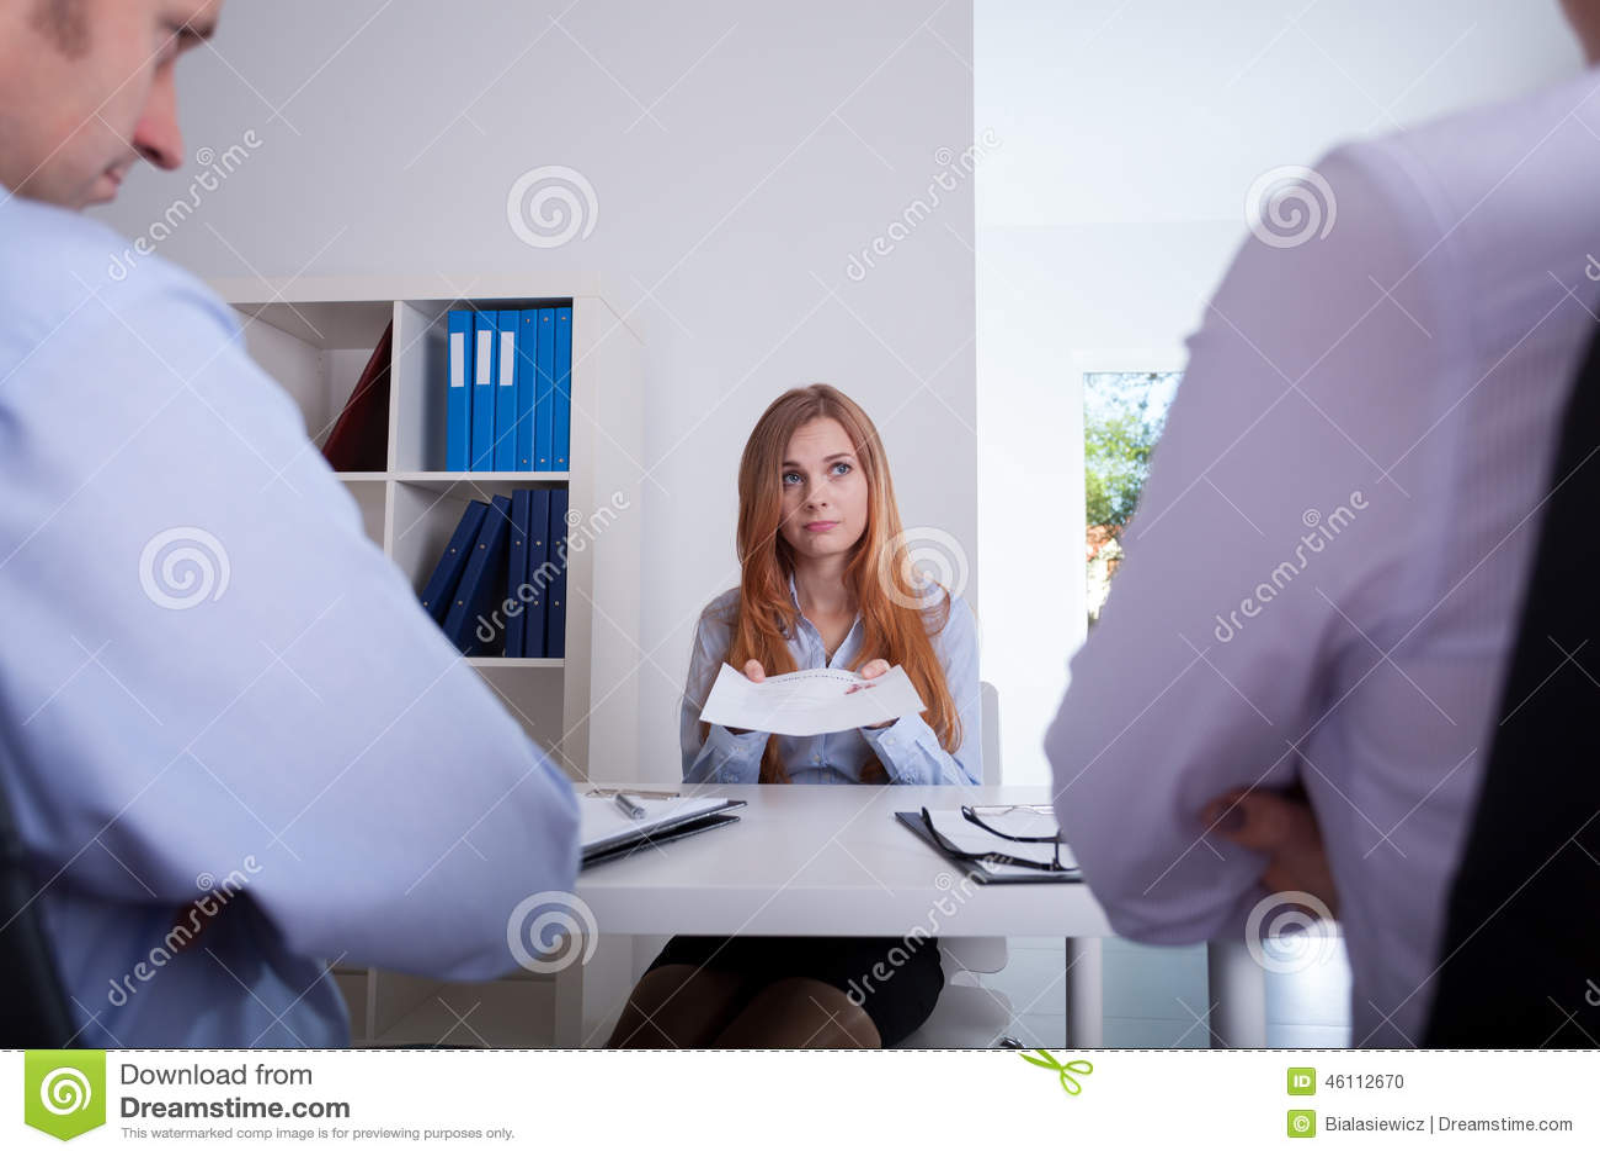 Girl on recruitment meeting